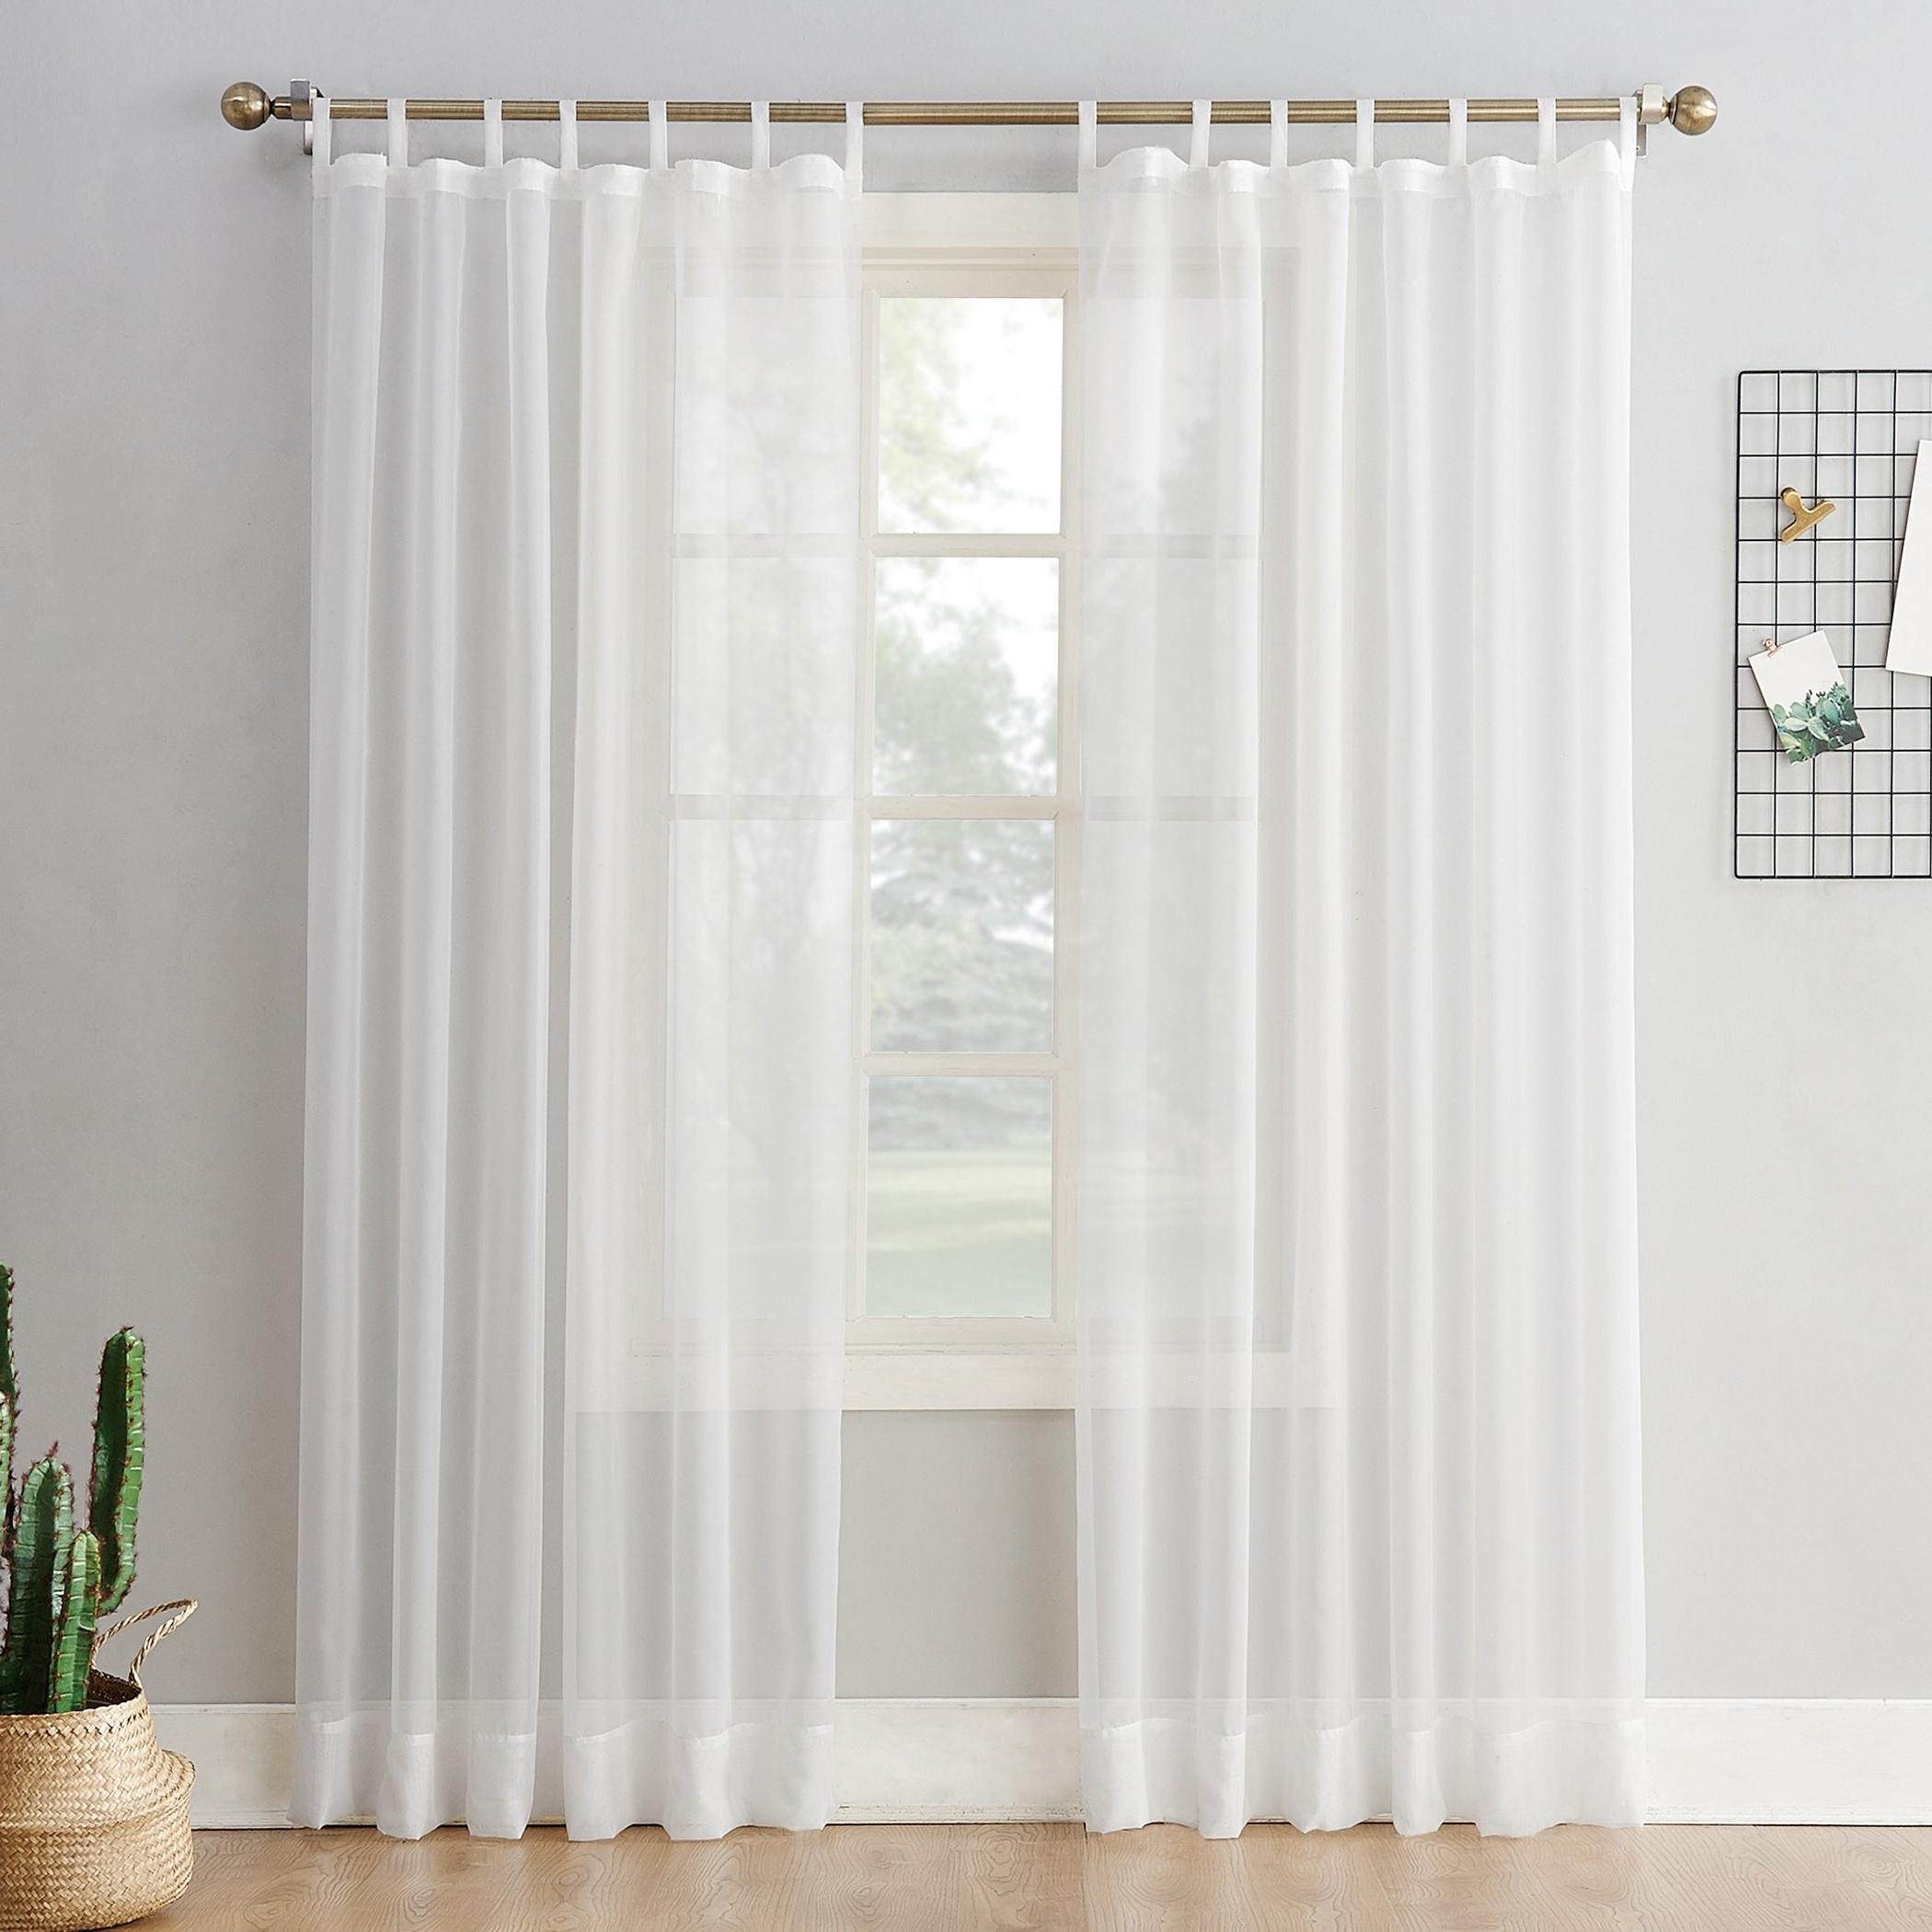 Favorite Emily Sheer Voile Single Curtain Panels Regarding No (View 9 of 20)